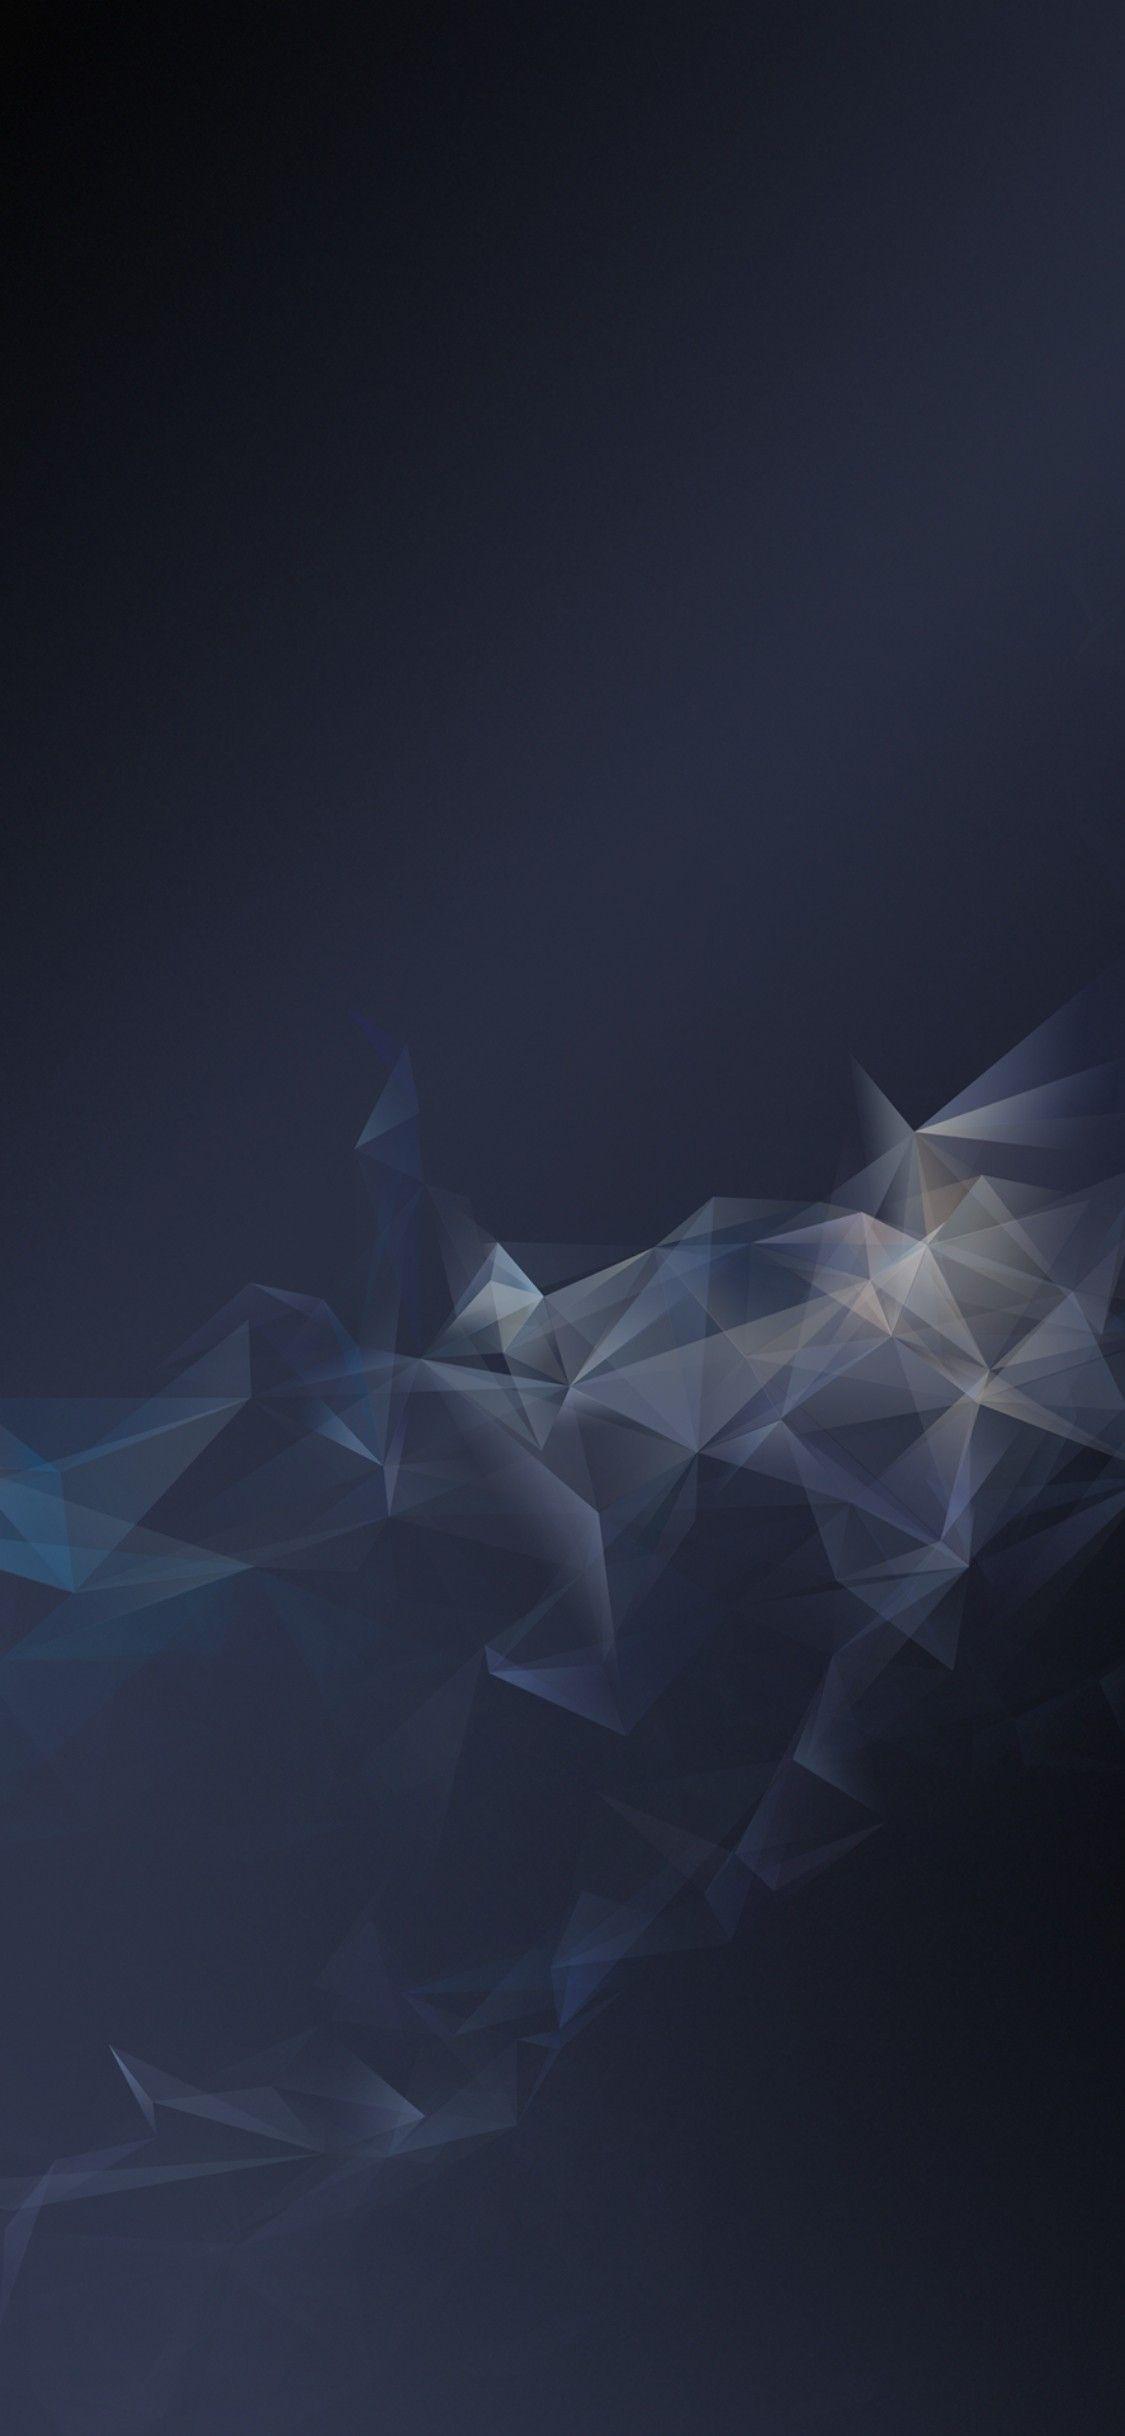 Grey, s9, s9 plus, wallpaper, galaxy, colour, abstract, digital art, s8, s9, walls, Samsung ...